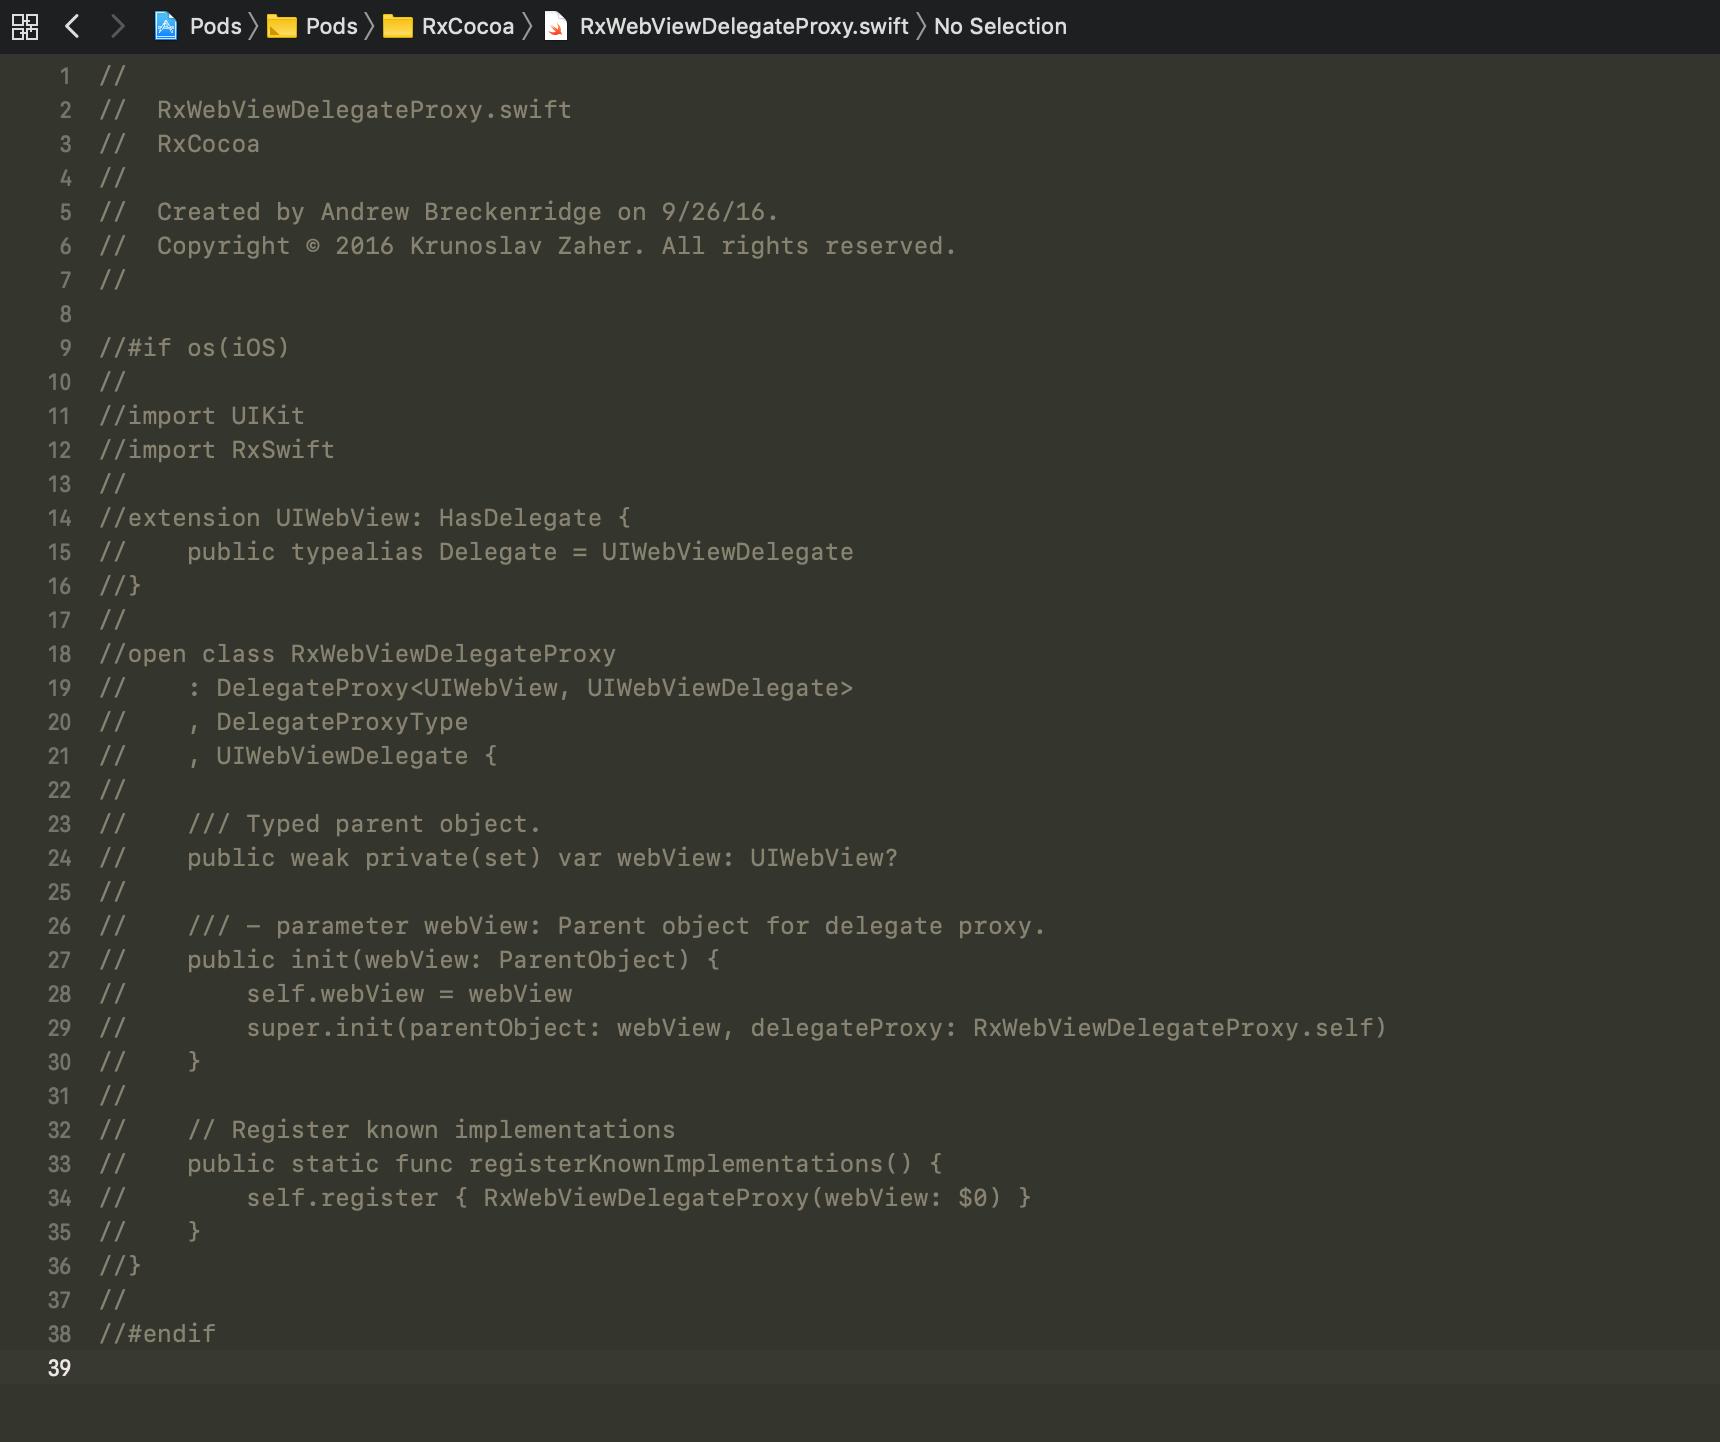 screenshot 68.png